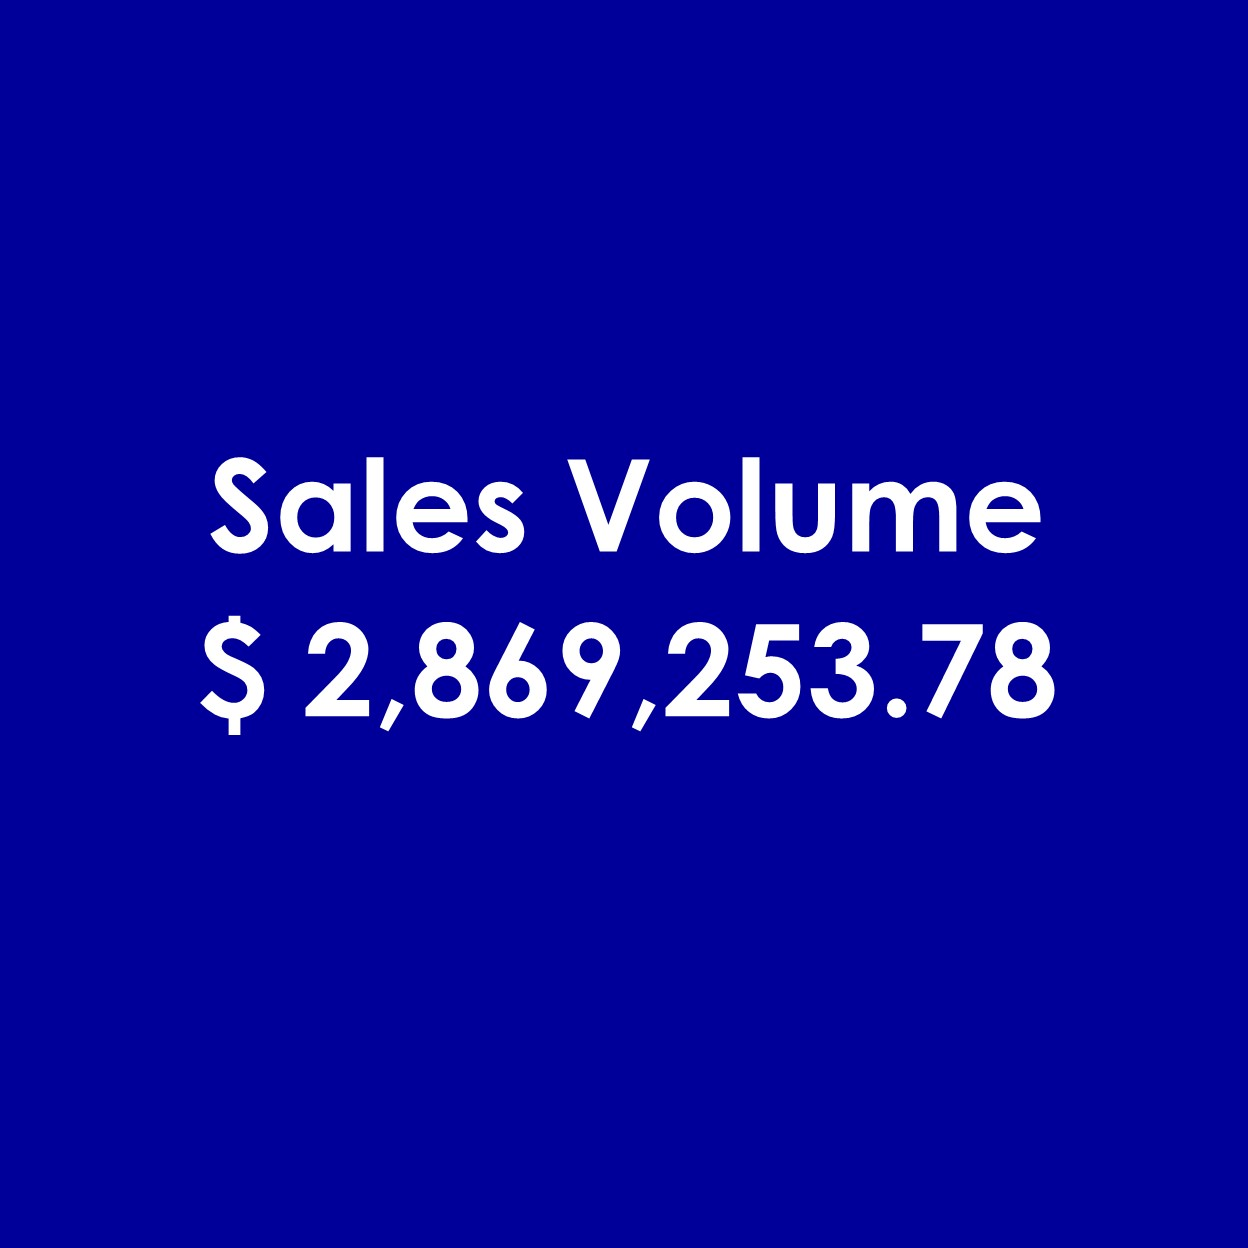 The Wynn Group's Sales Volume